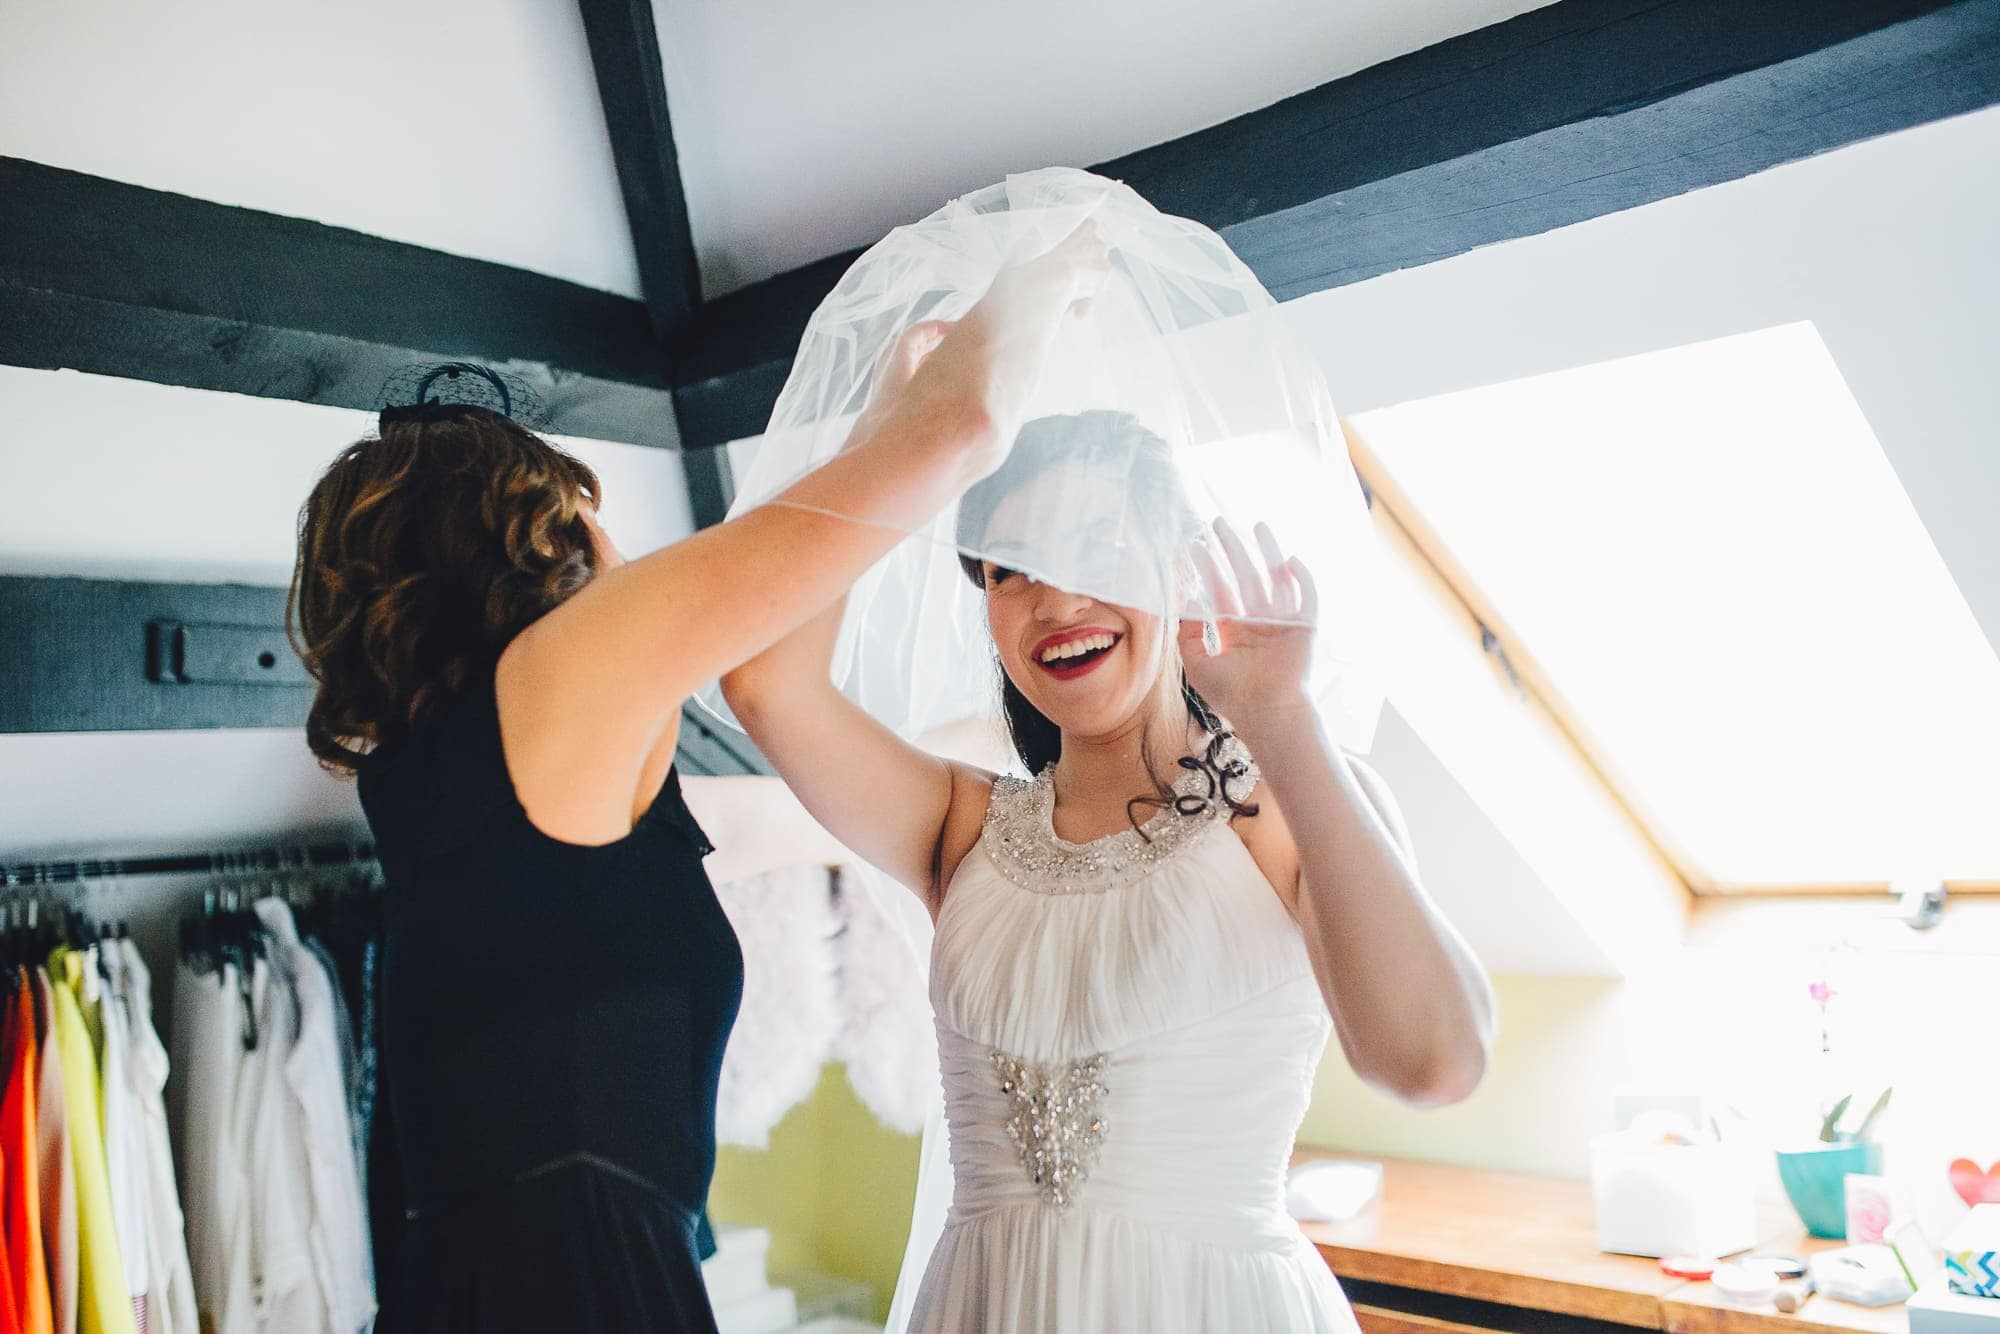 Matlt-Cross-Nottingham-wedding-Photography-16